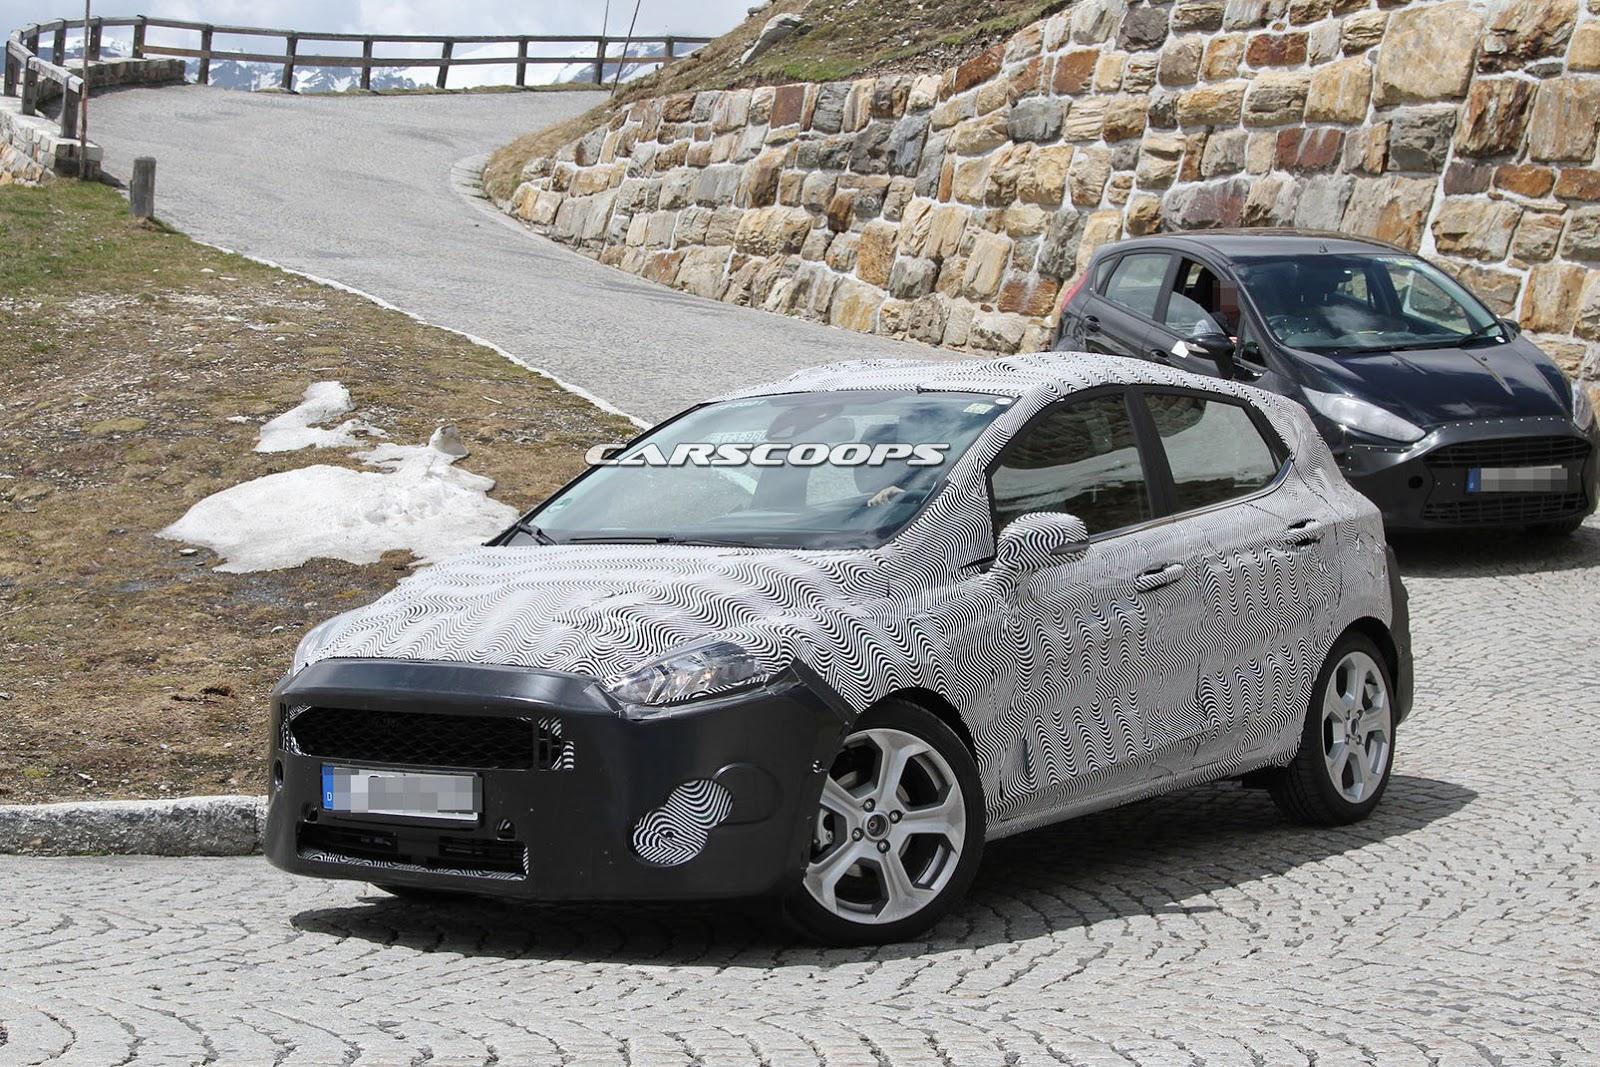 2018-Ford-Fiesta-2